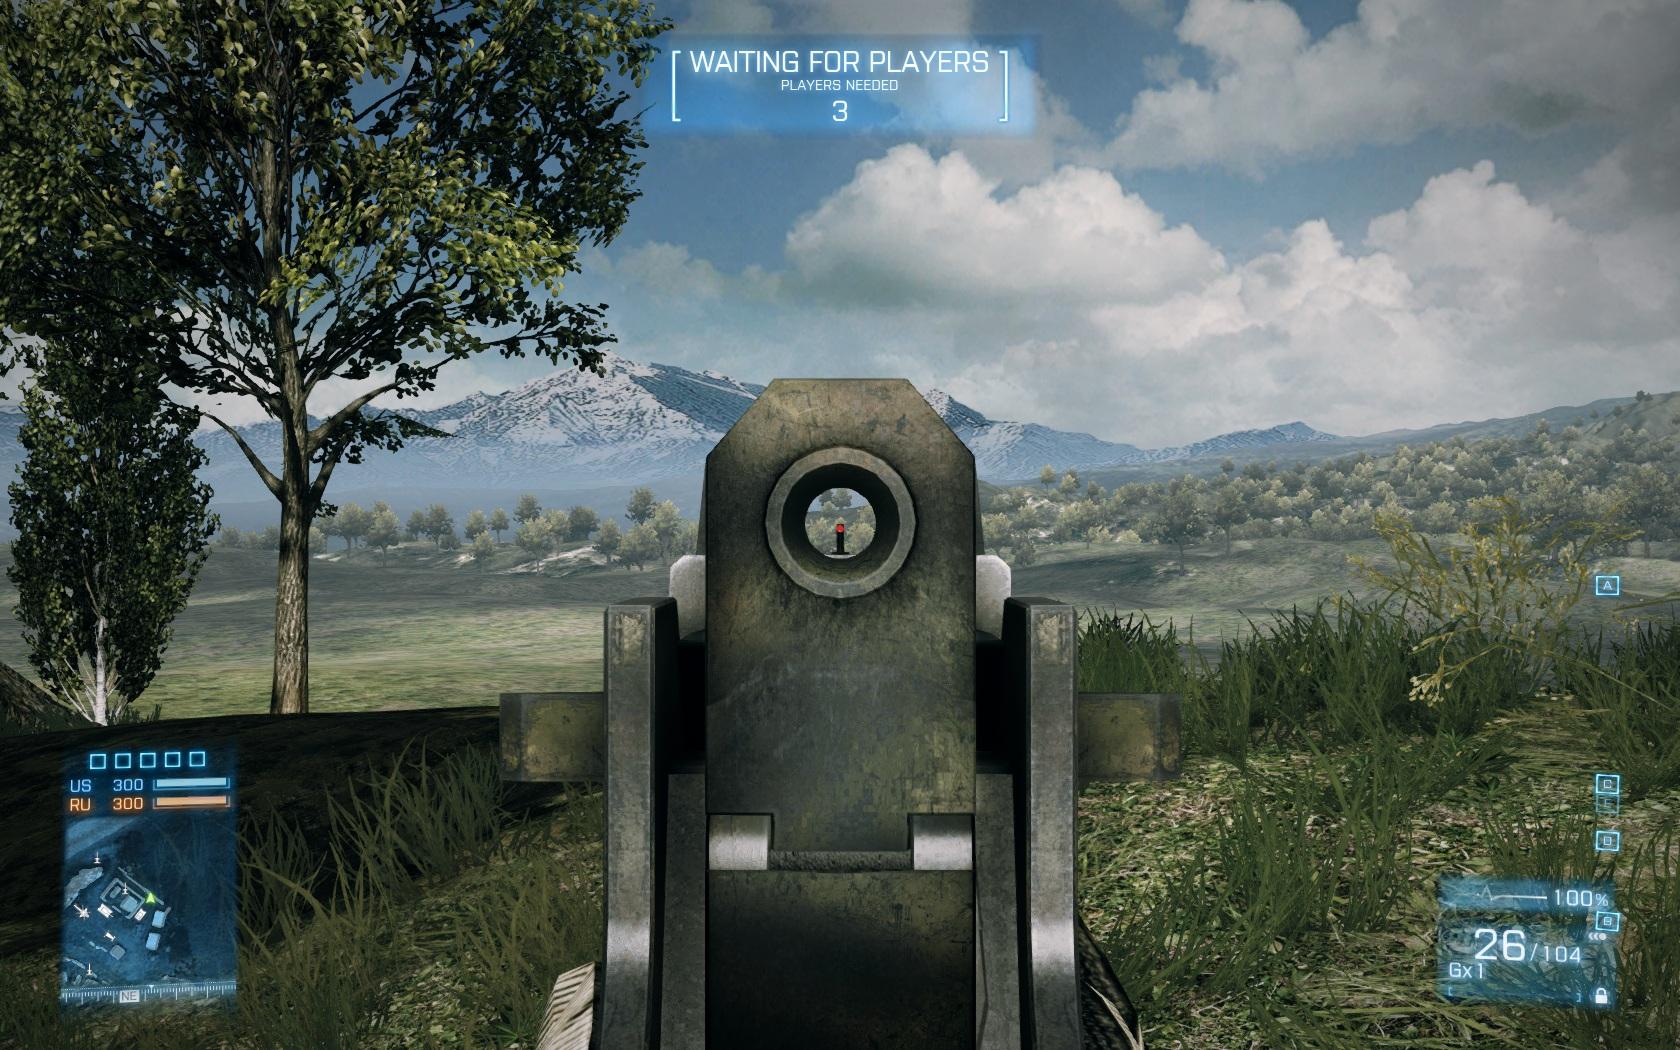 Maestro Armero: Famas (Battlefield 3)